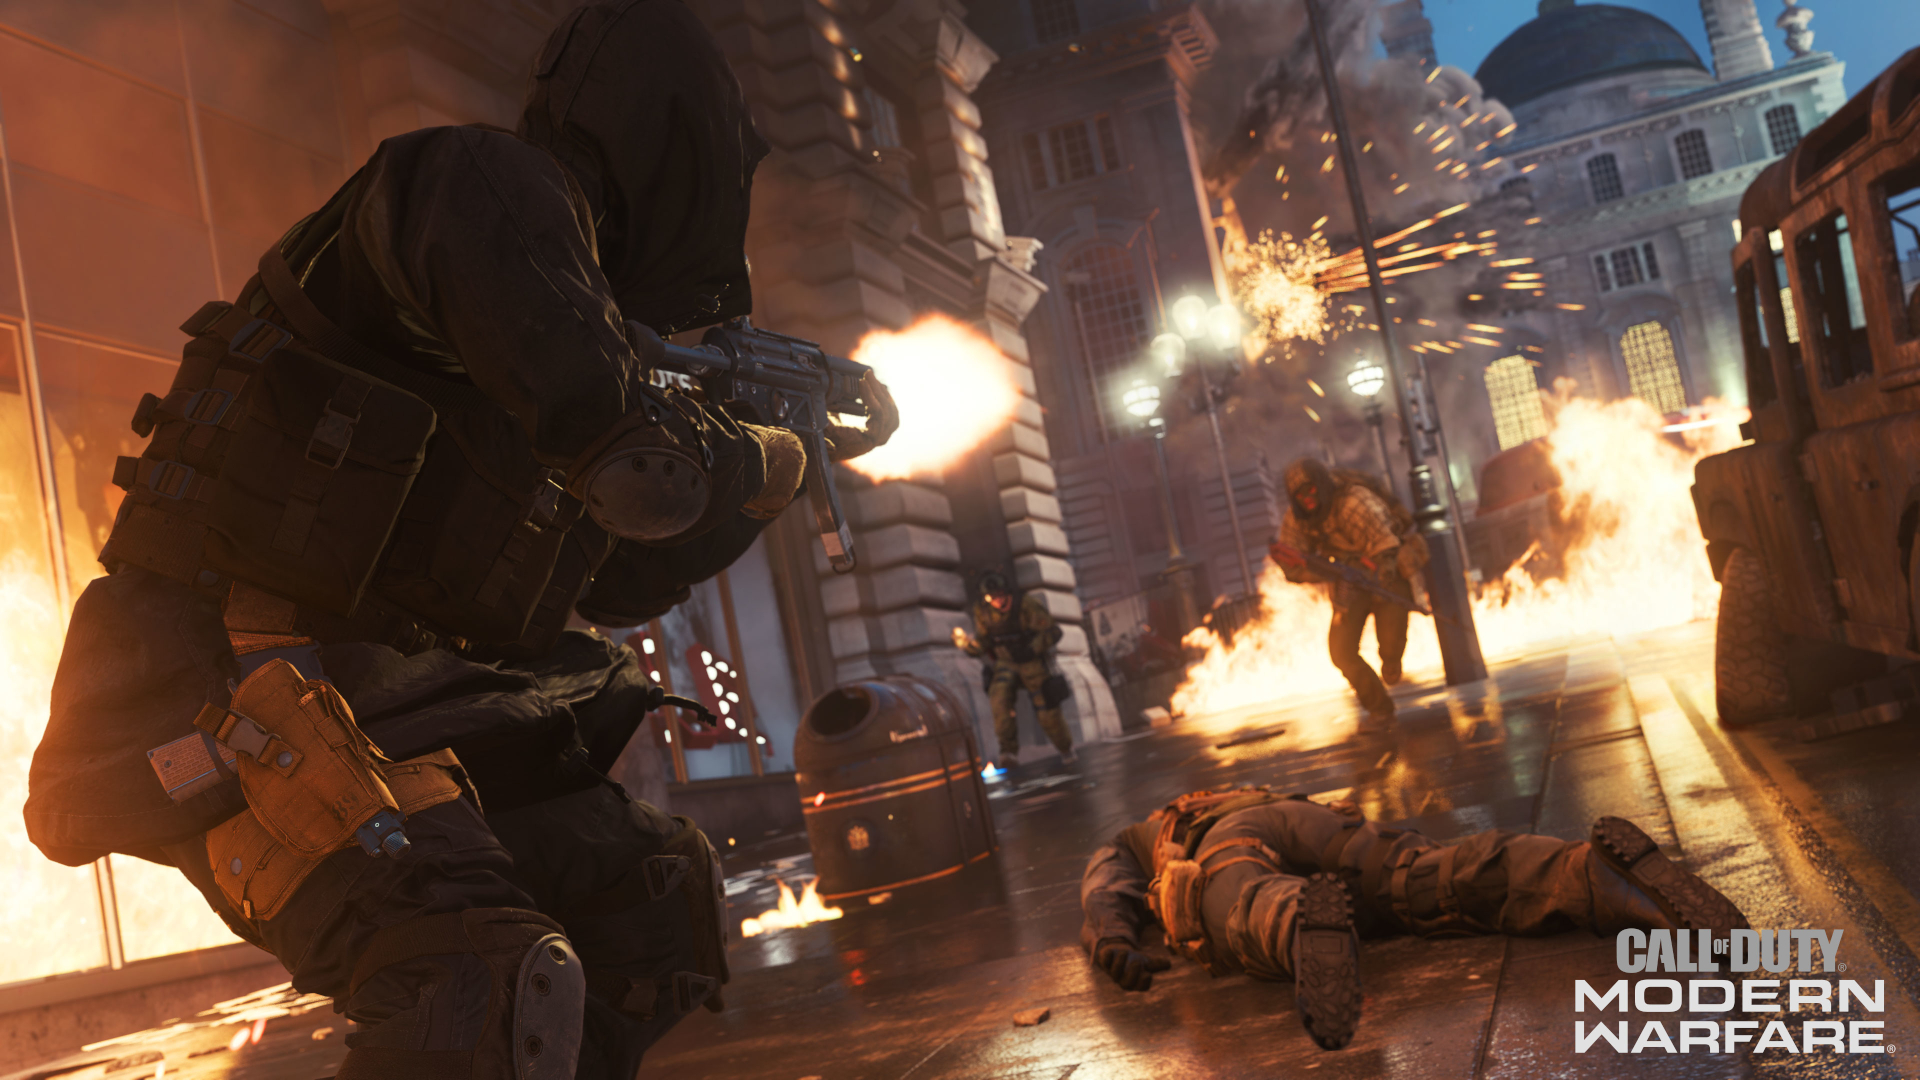 """Call of Duty: Modern Warfare"": Neuer Patch schwächt Waffen erneut ab"